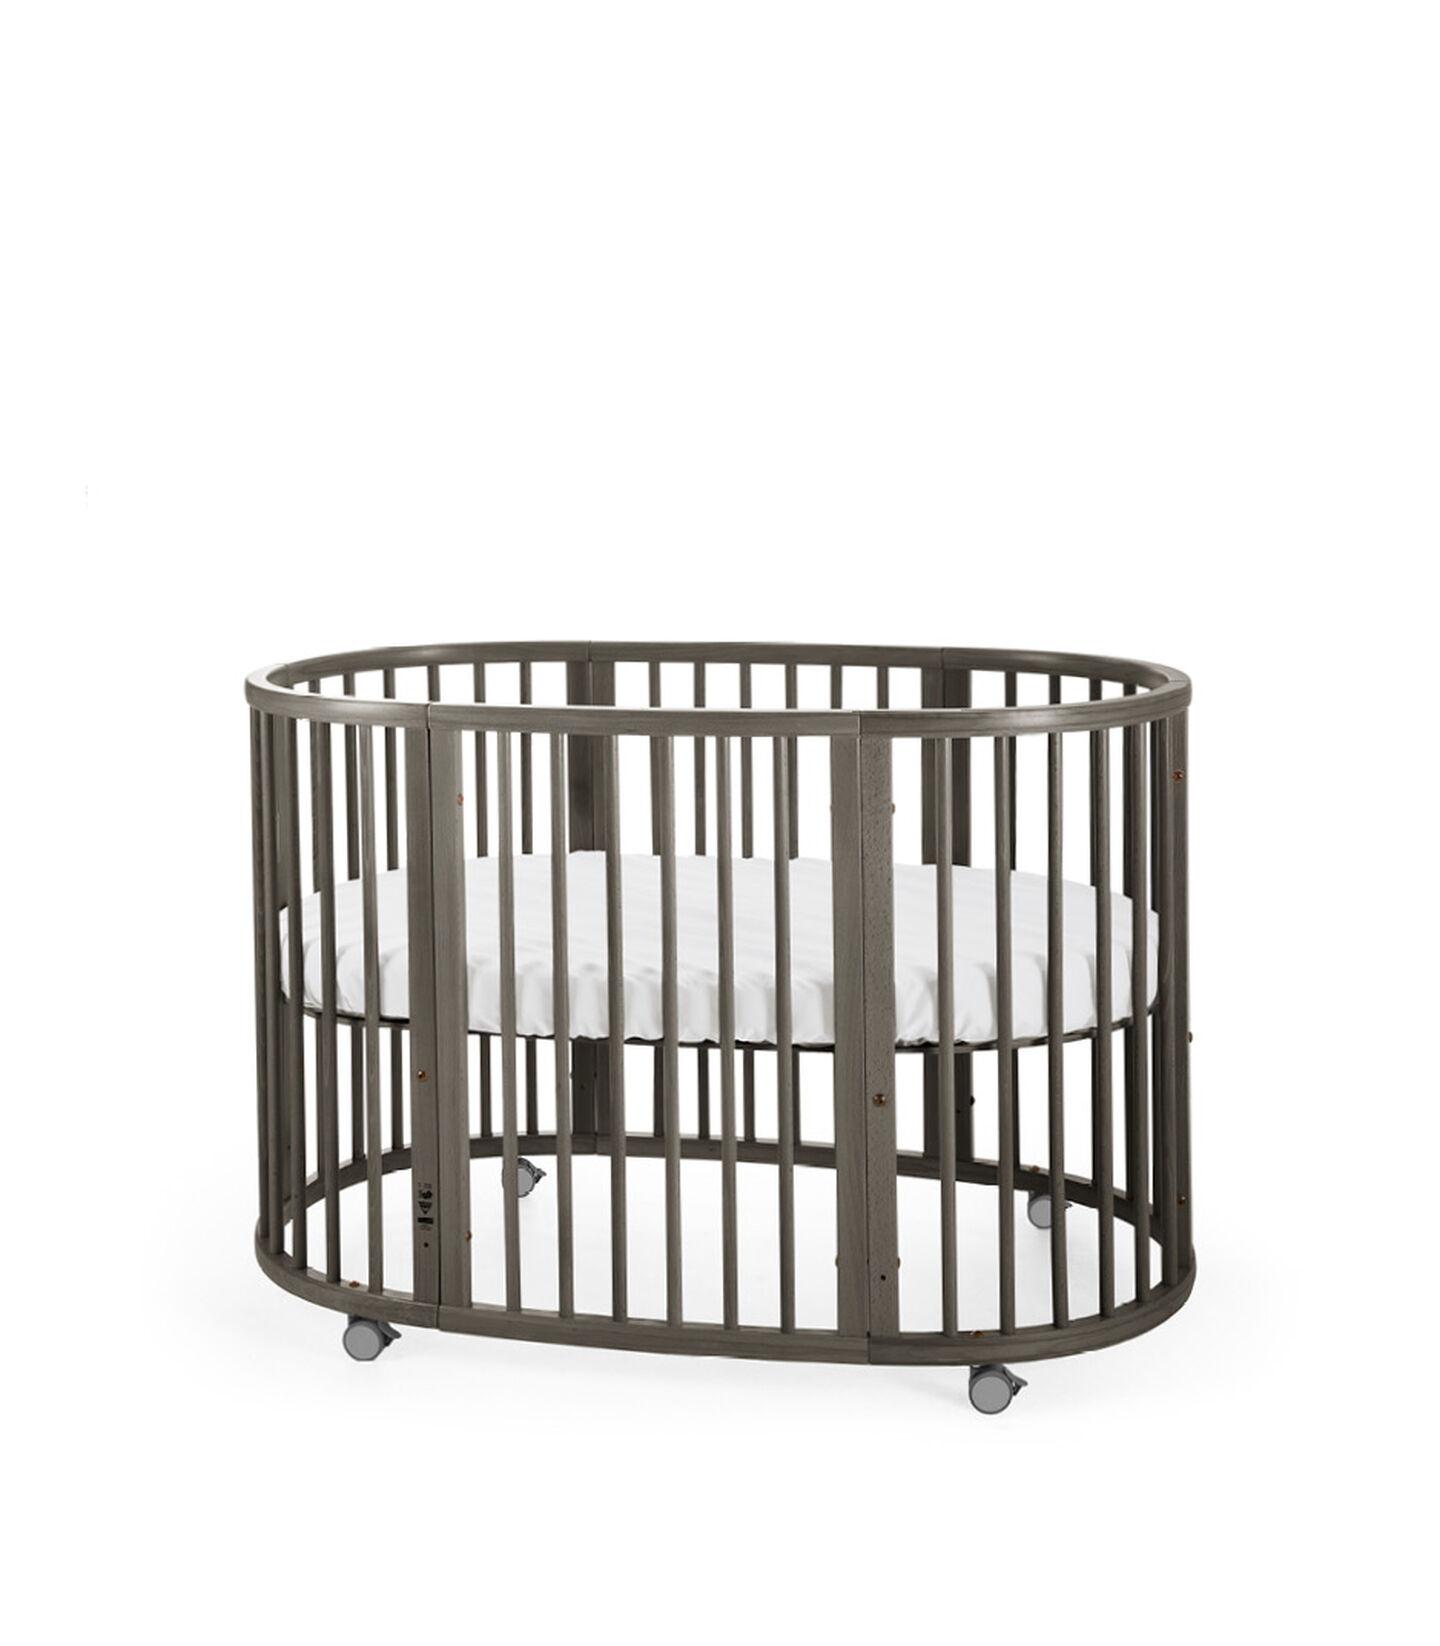 Stokke® Sleepi™ Bed Hazy Grey, Hazy Grey, mainview view 1